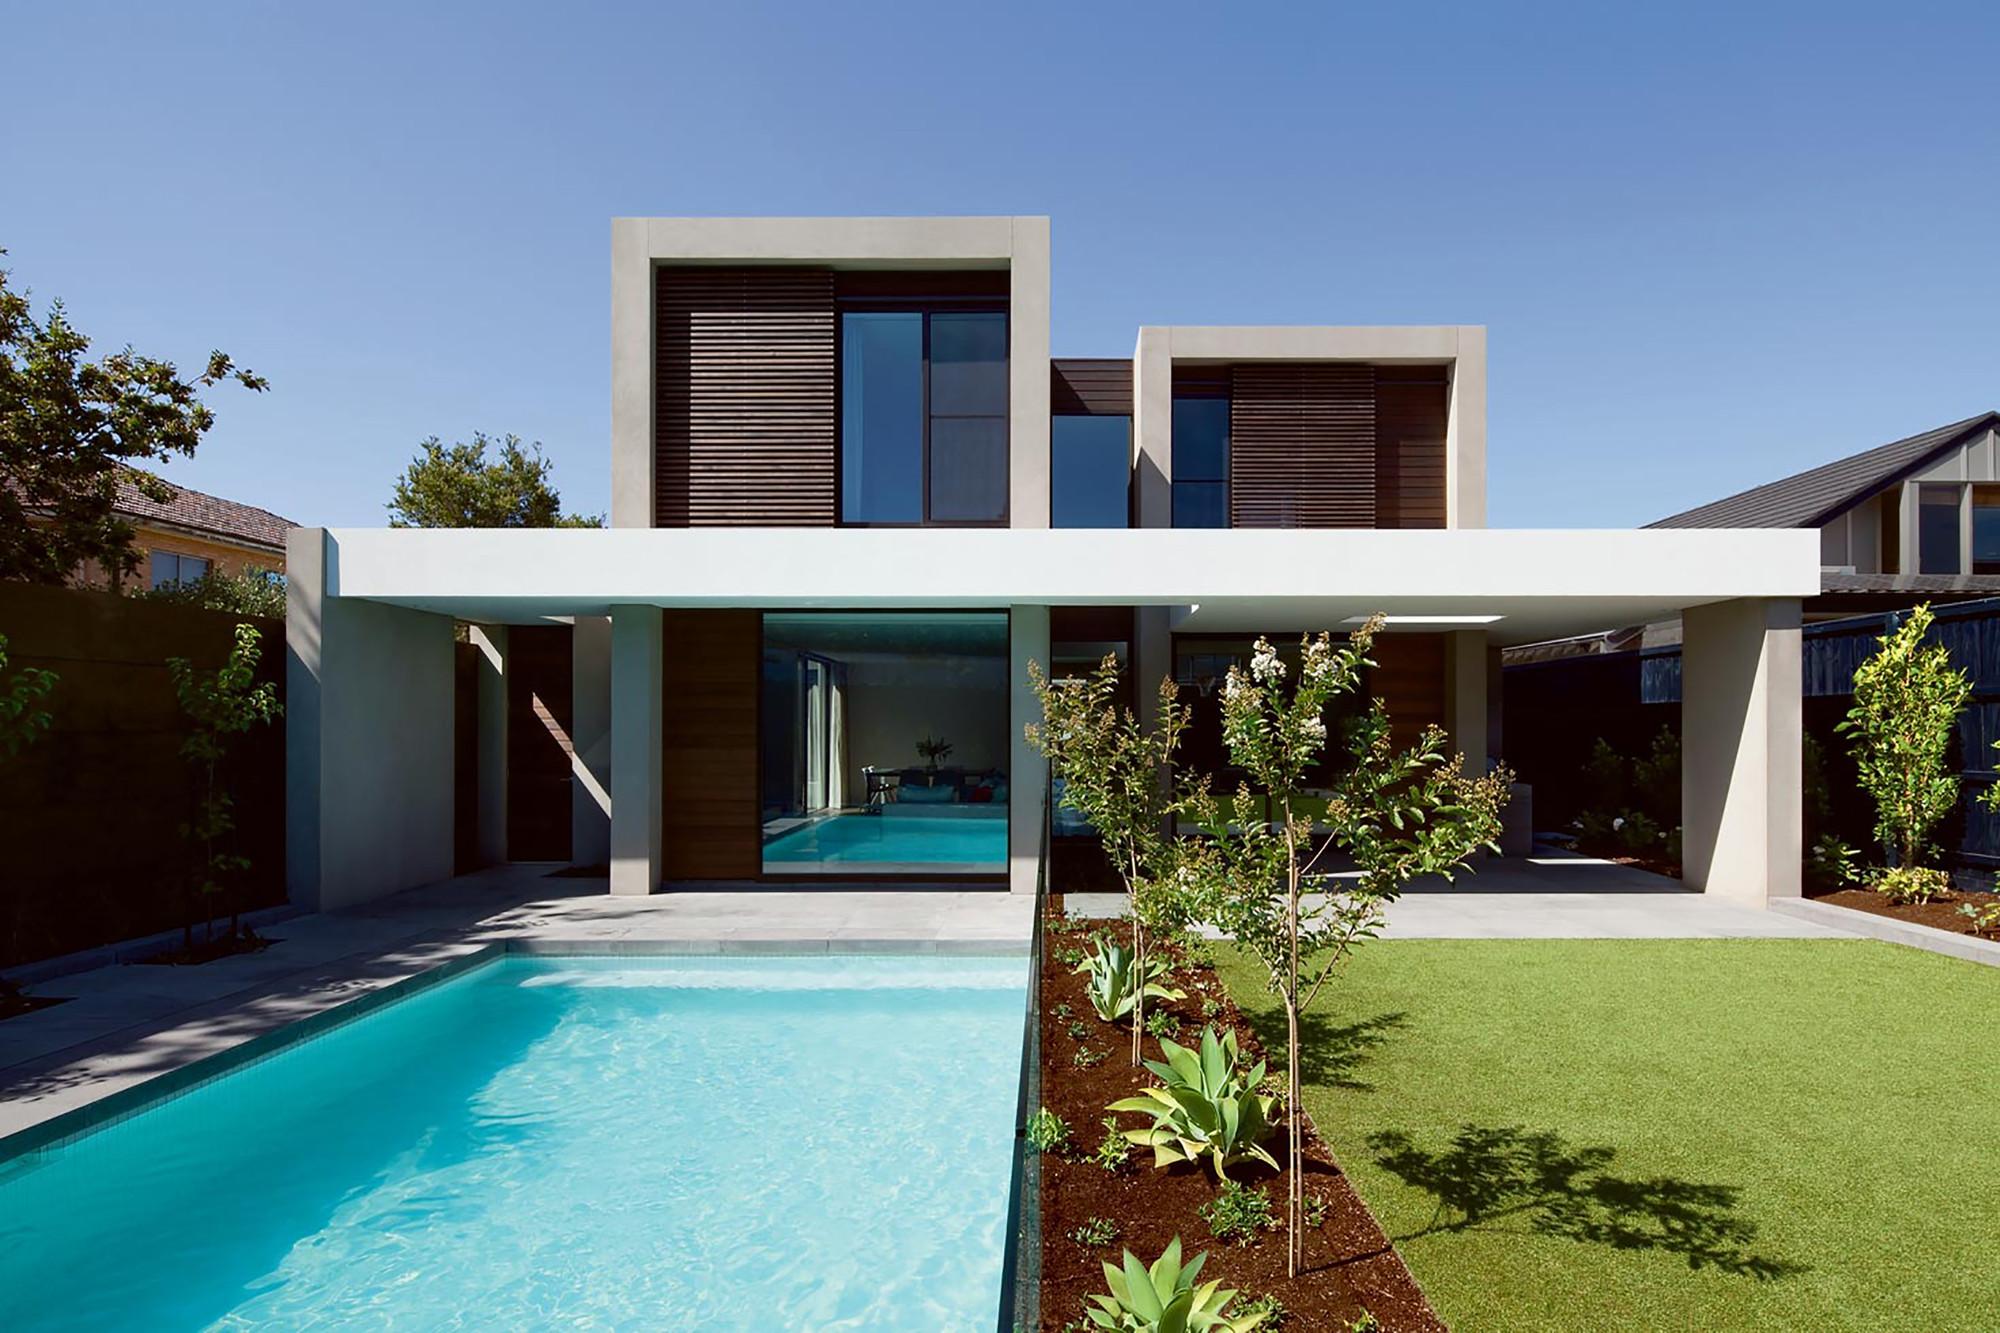 California House By Inform Design & Pleysier Perkins (10